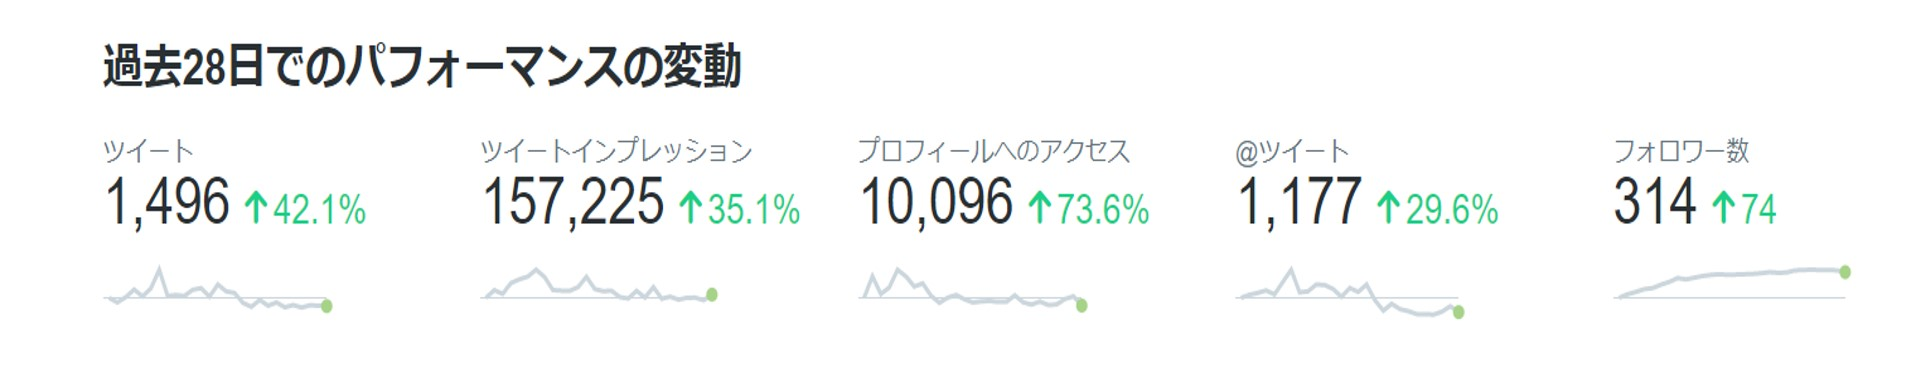 Twitterその他